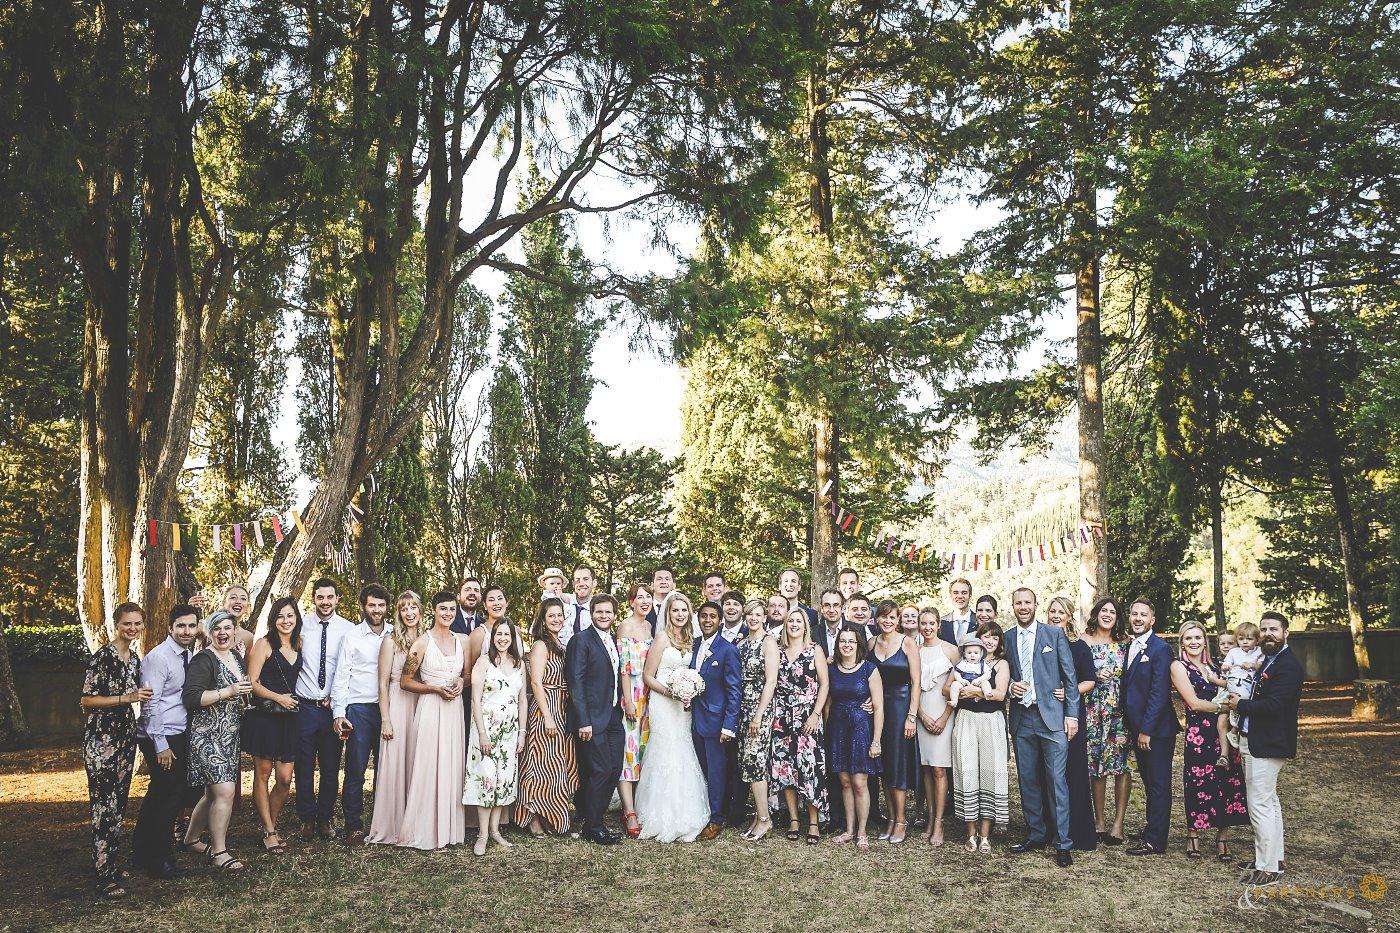 wedding_photos_villa_pitiana_12.jpg